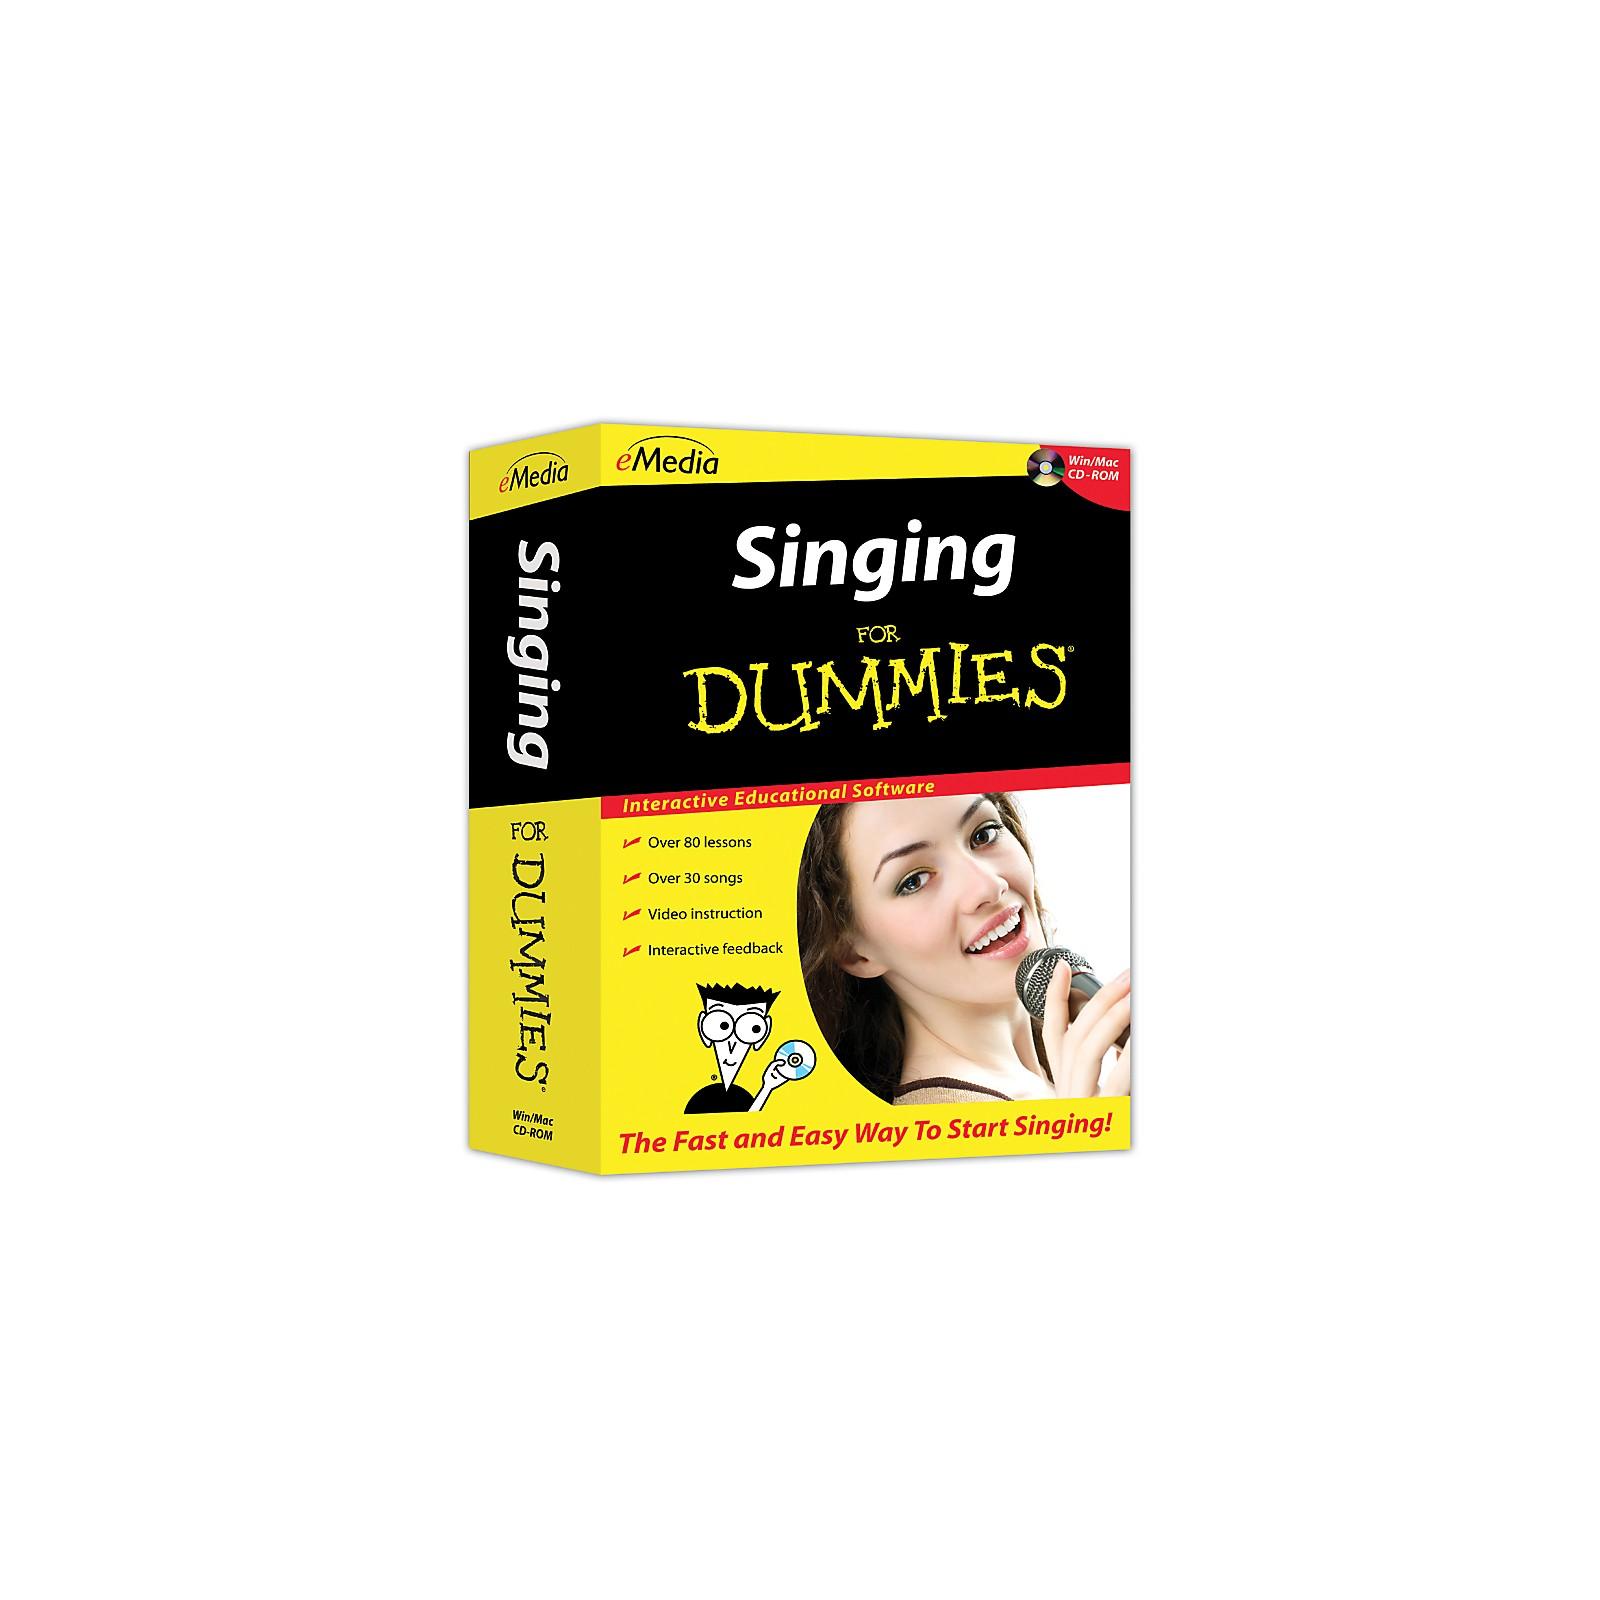 eMedia Singing For Dummies